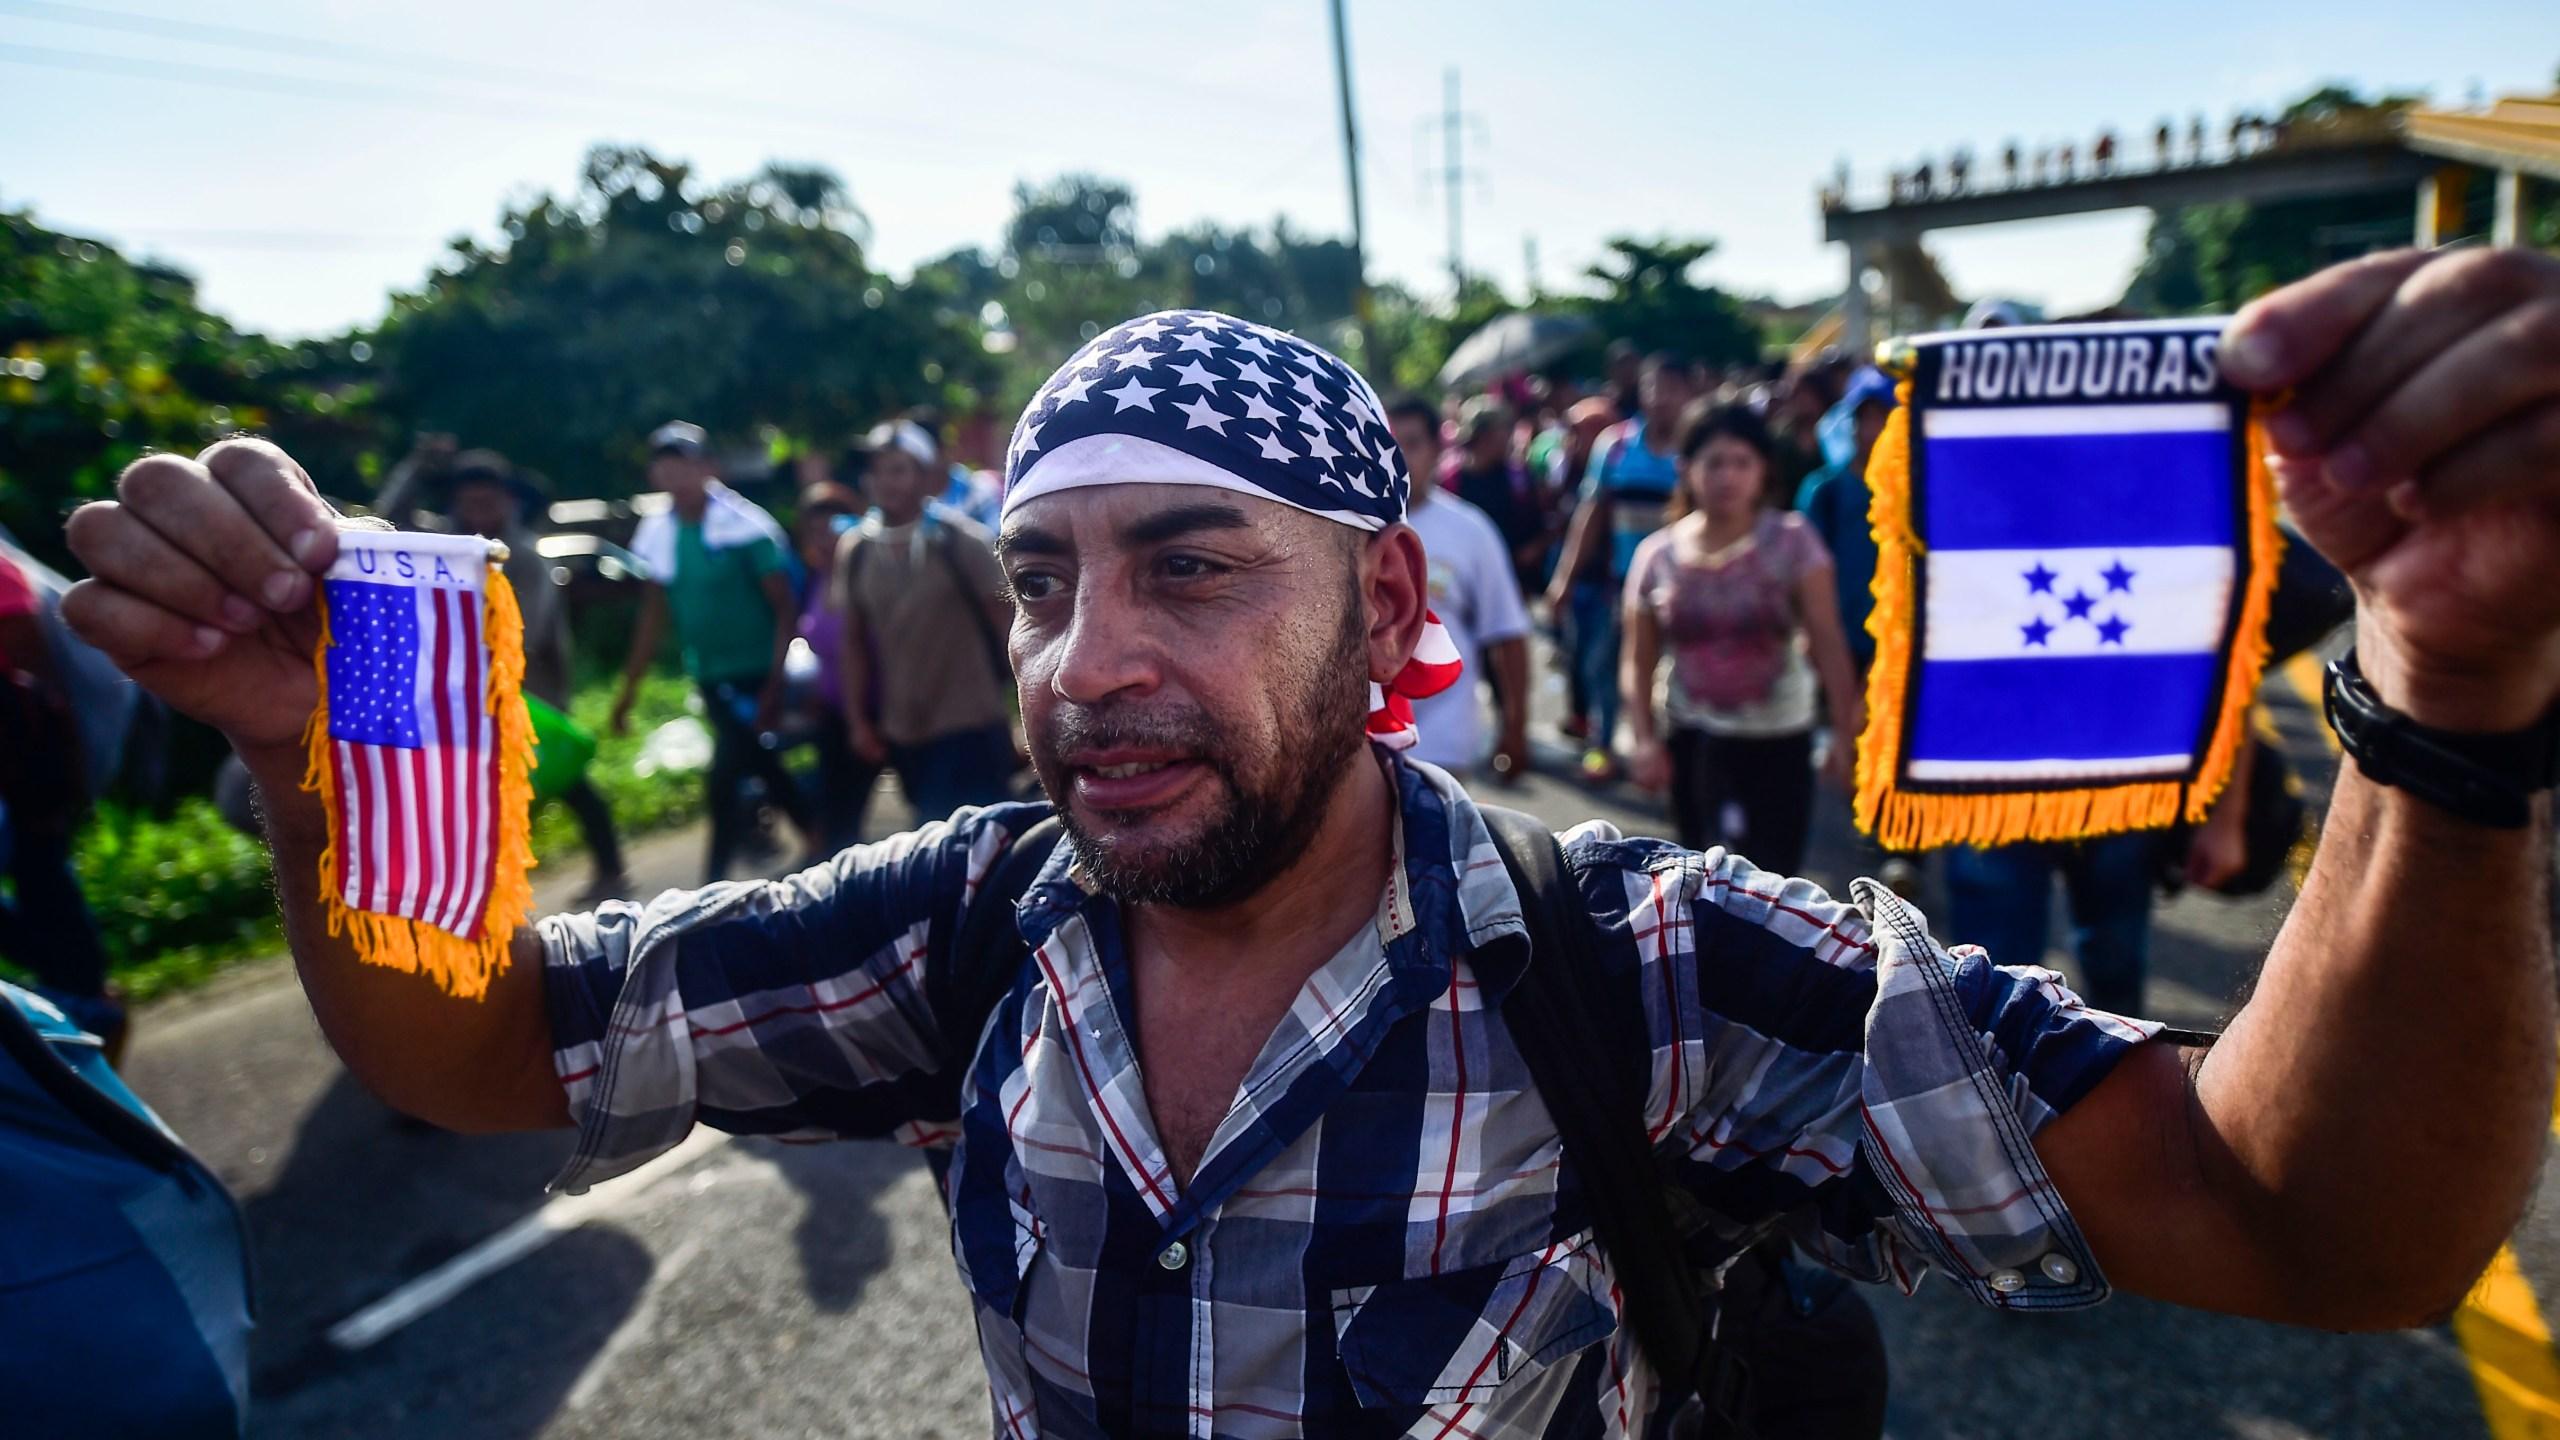 Nearly 1,000 Honduran Migrants Start Journey to U.S